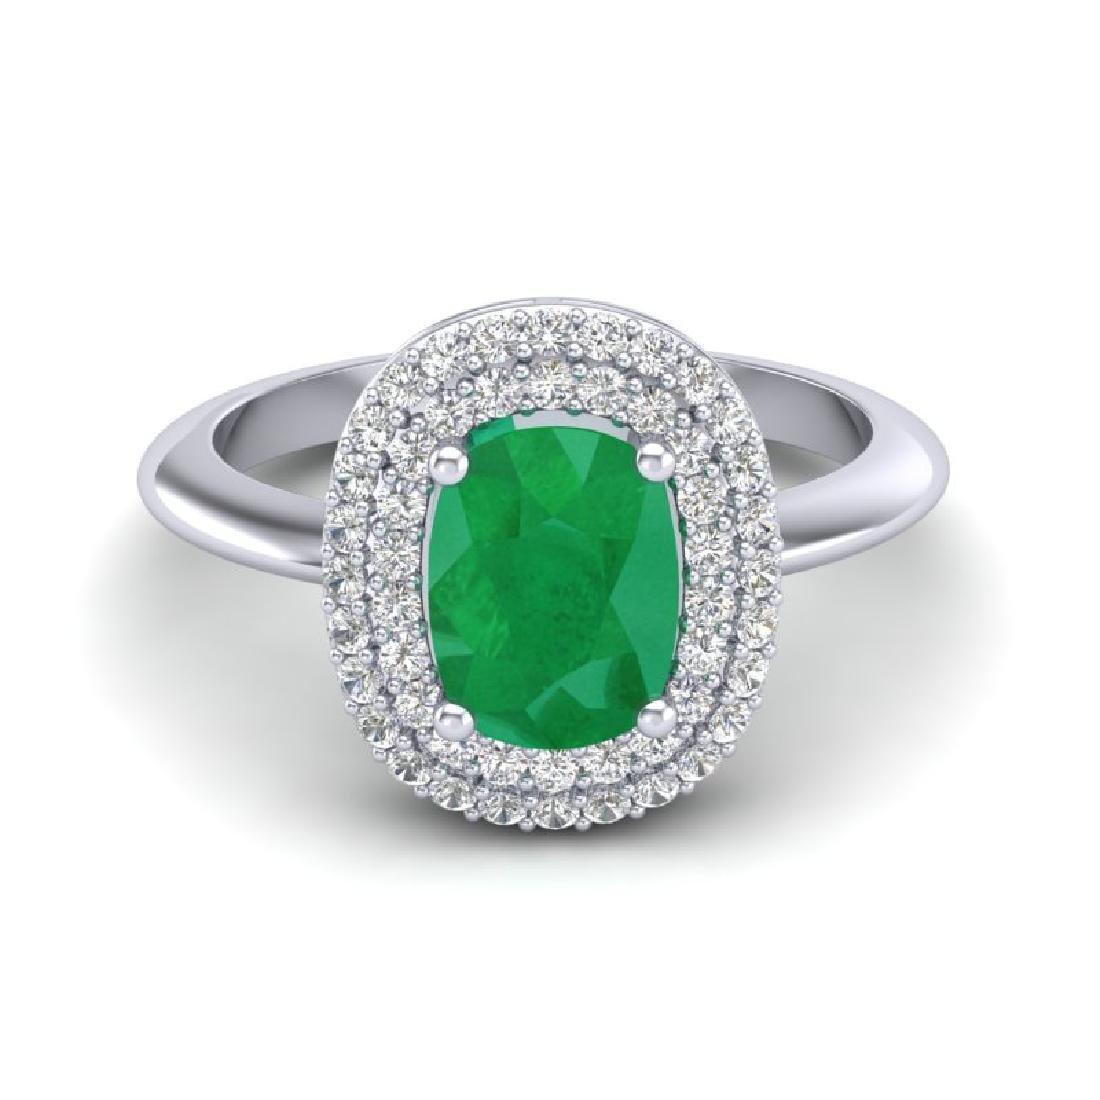 2.50 CTW Emerald With Micro VS/SI Diamond Ring Halo 14K